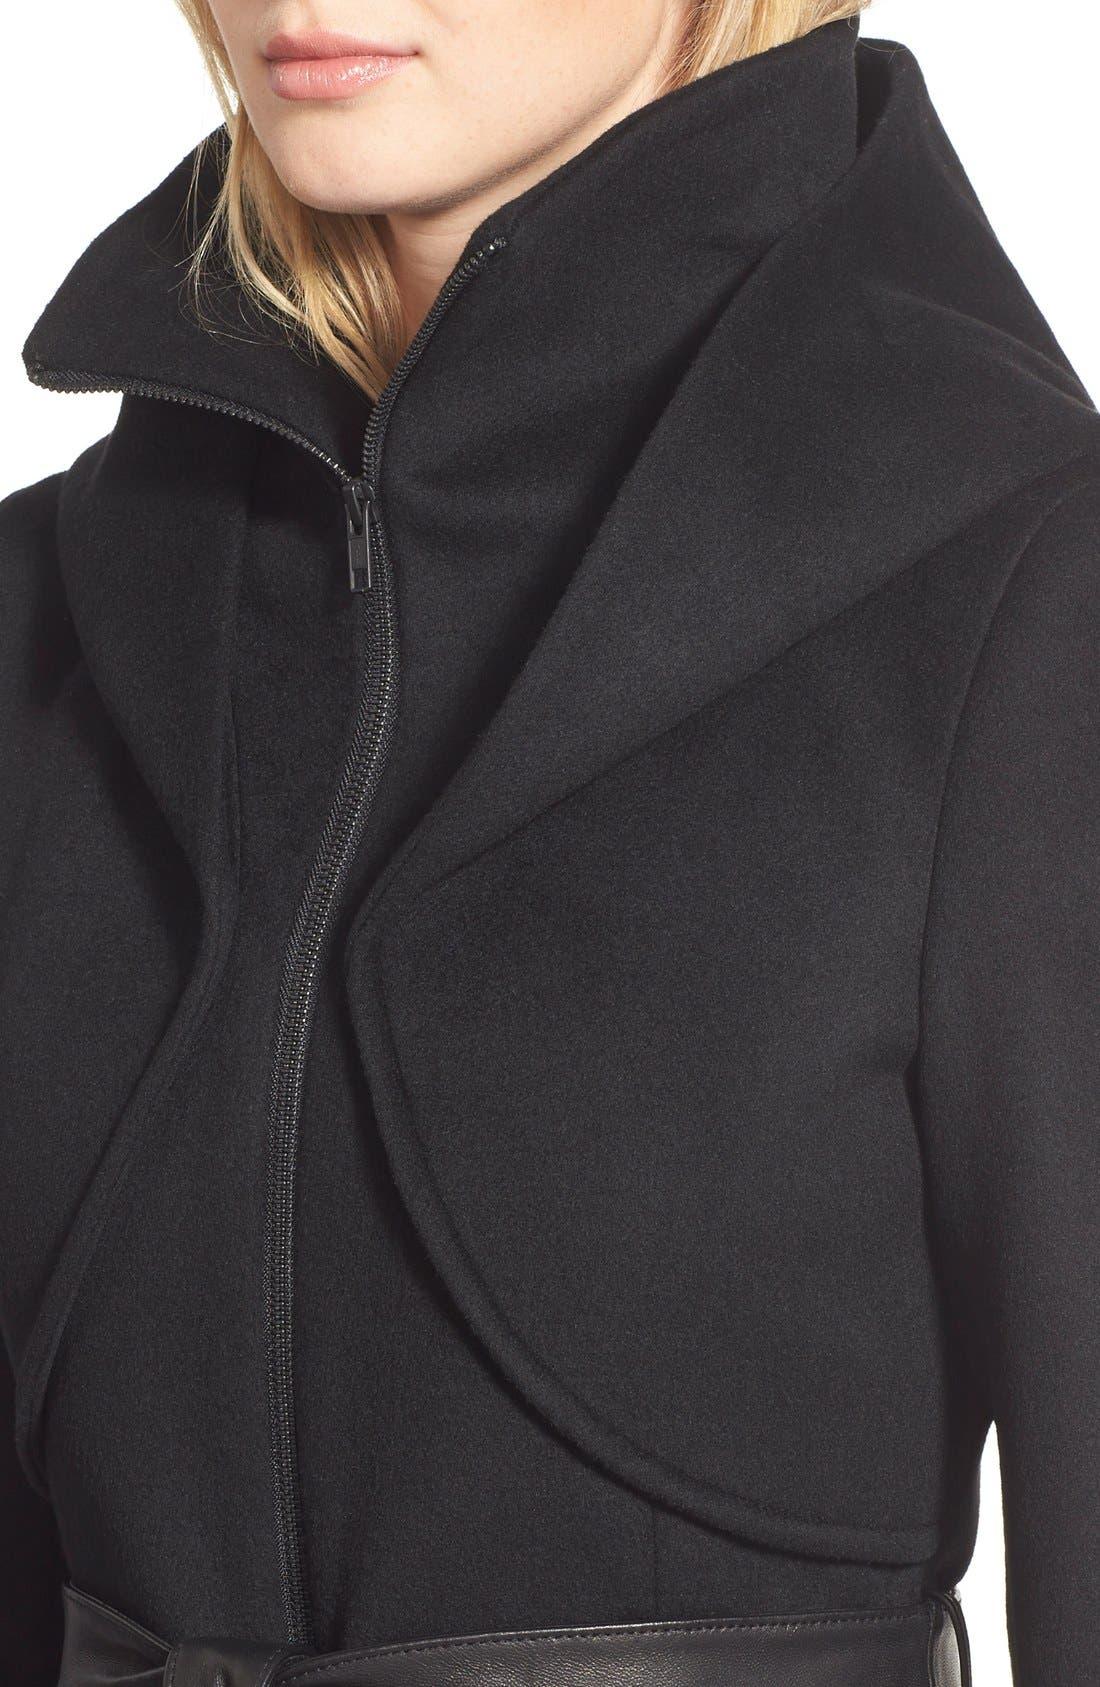 Alternate Image 3  - Soia & Kyo 'Arya' Hooded Wool Blend Coat with Belt